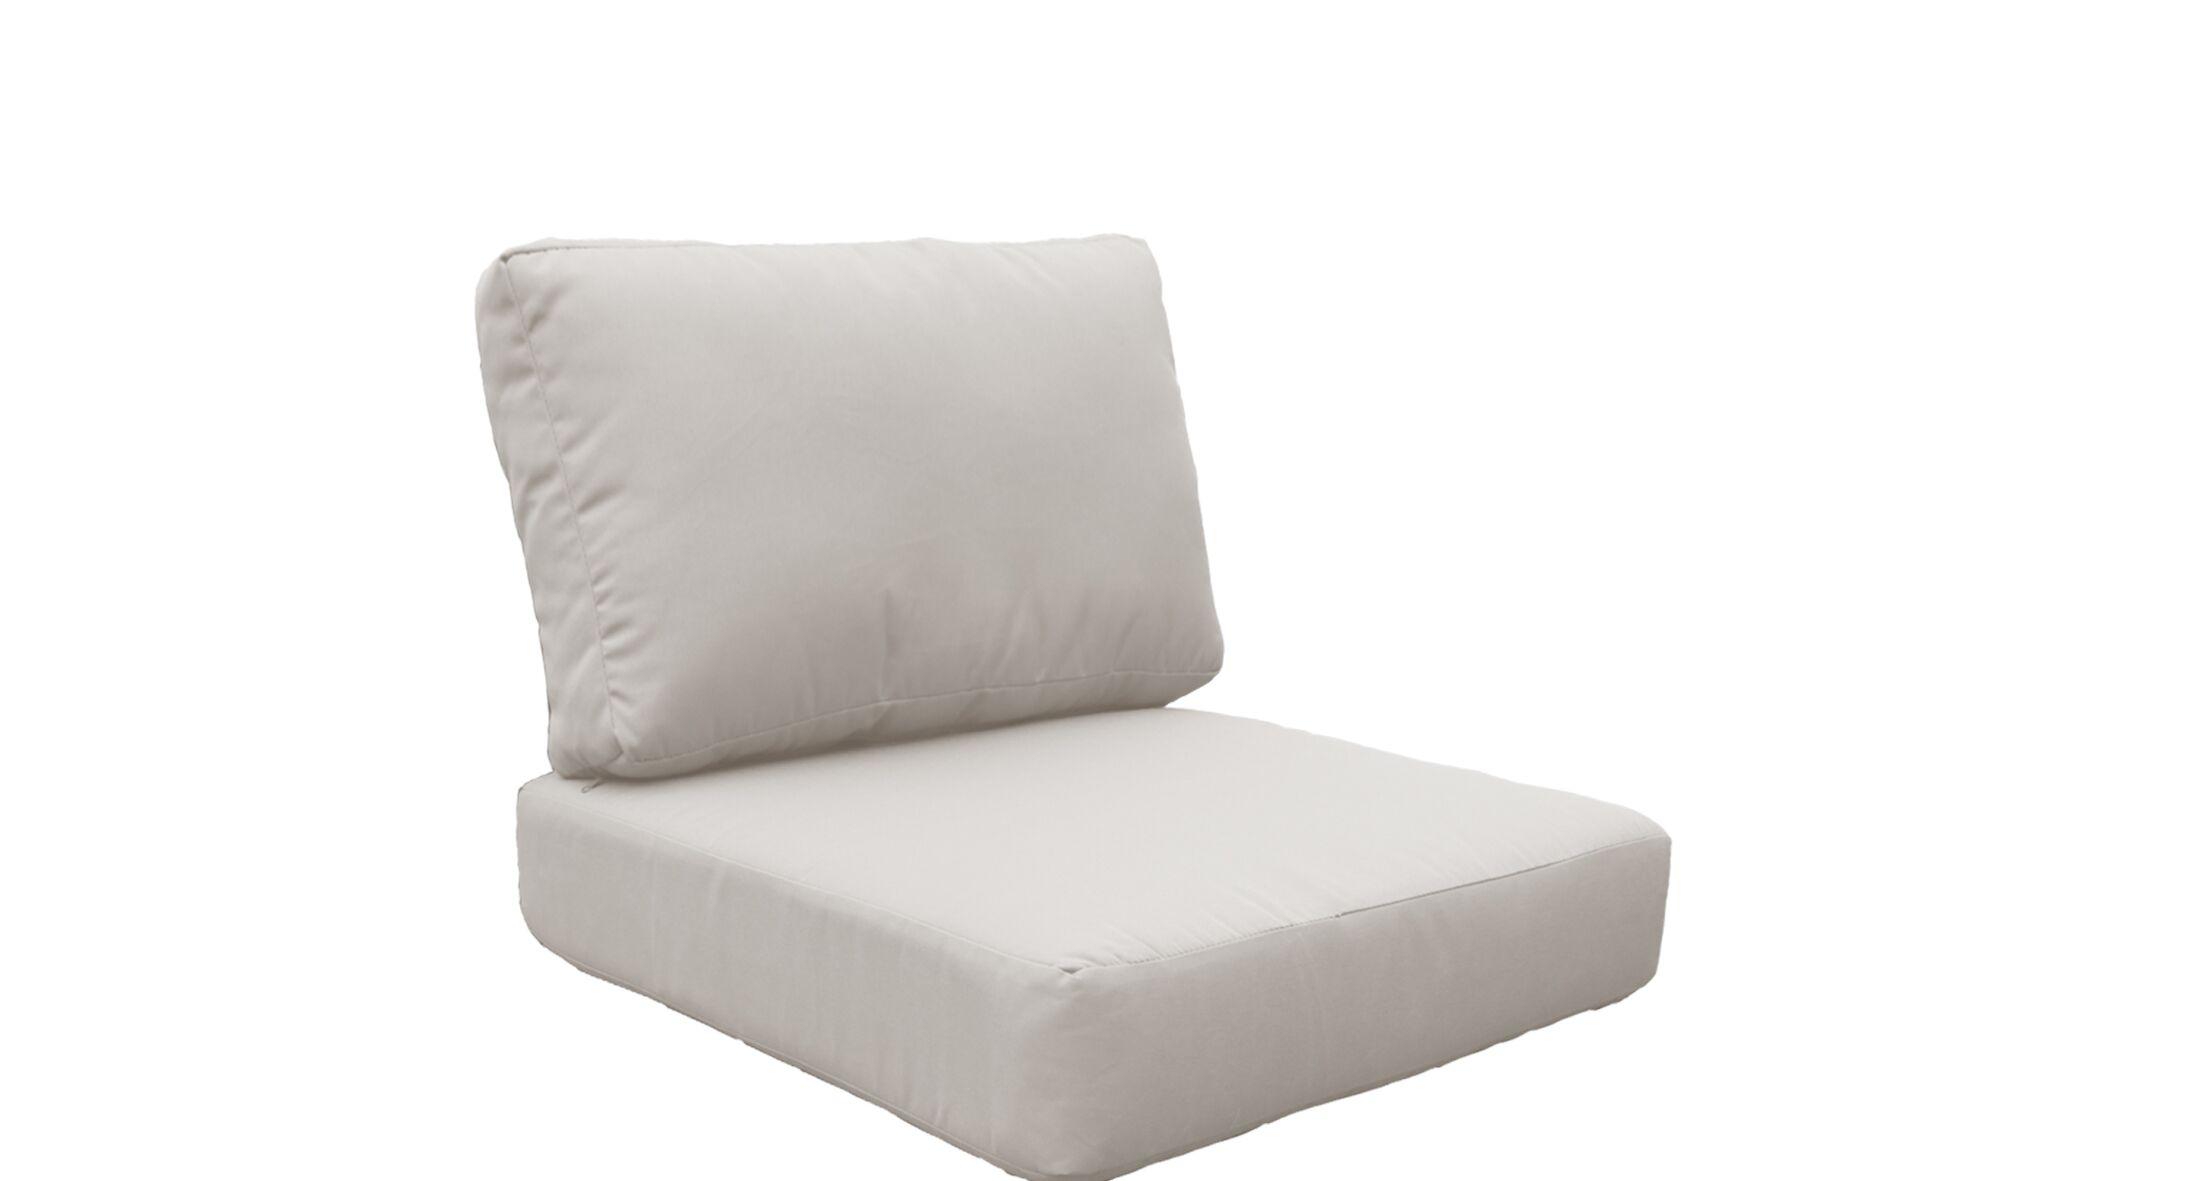 Fairmont 10 Piece Outdoor Lounge Chair Cushion Set Fabric: Beige